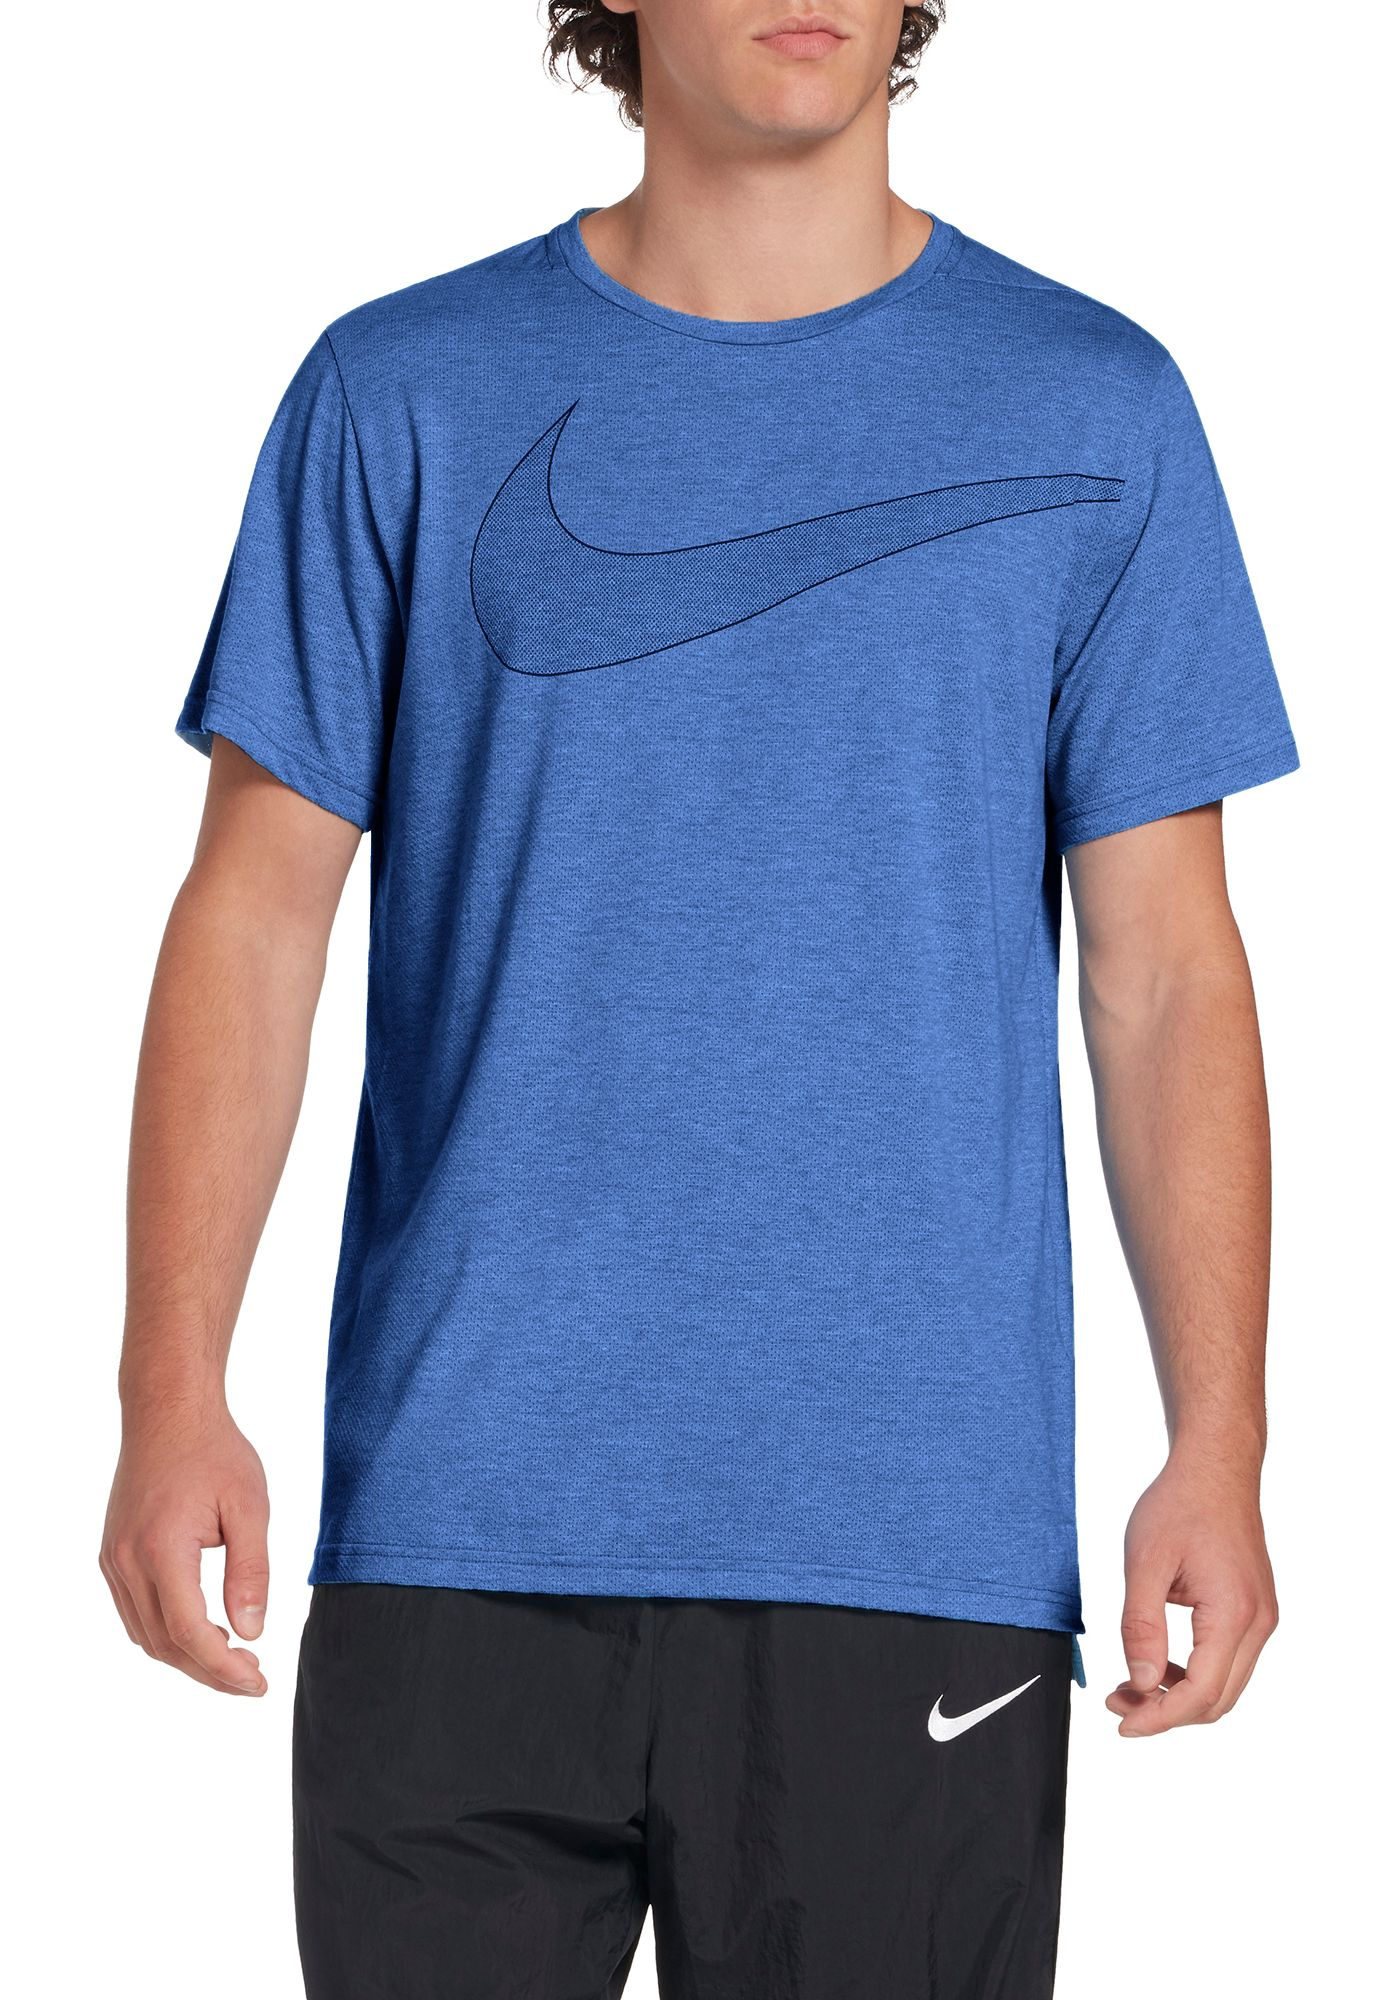 Nike Men's Dri-FIT Breathe Short Sleeve Training Top